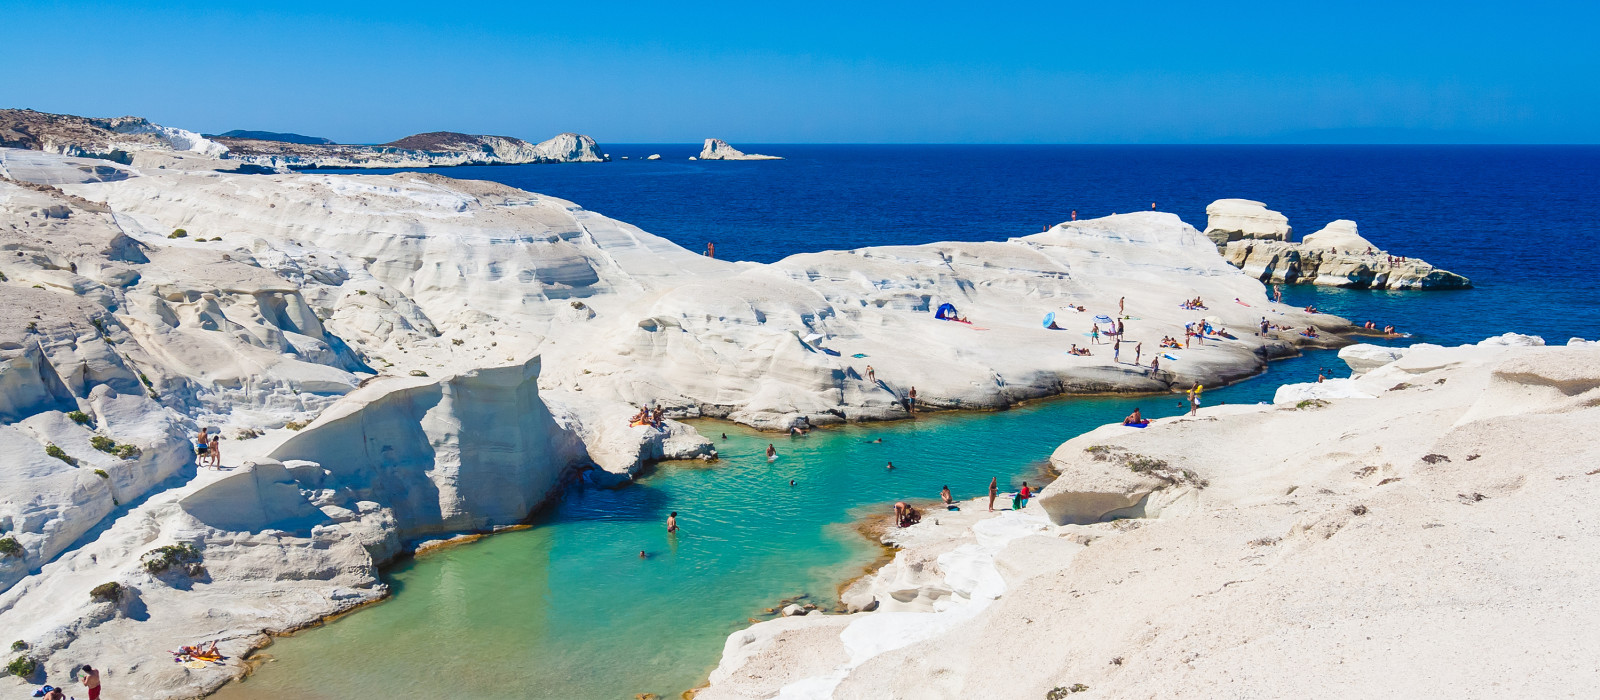 Destination Milos Greece